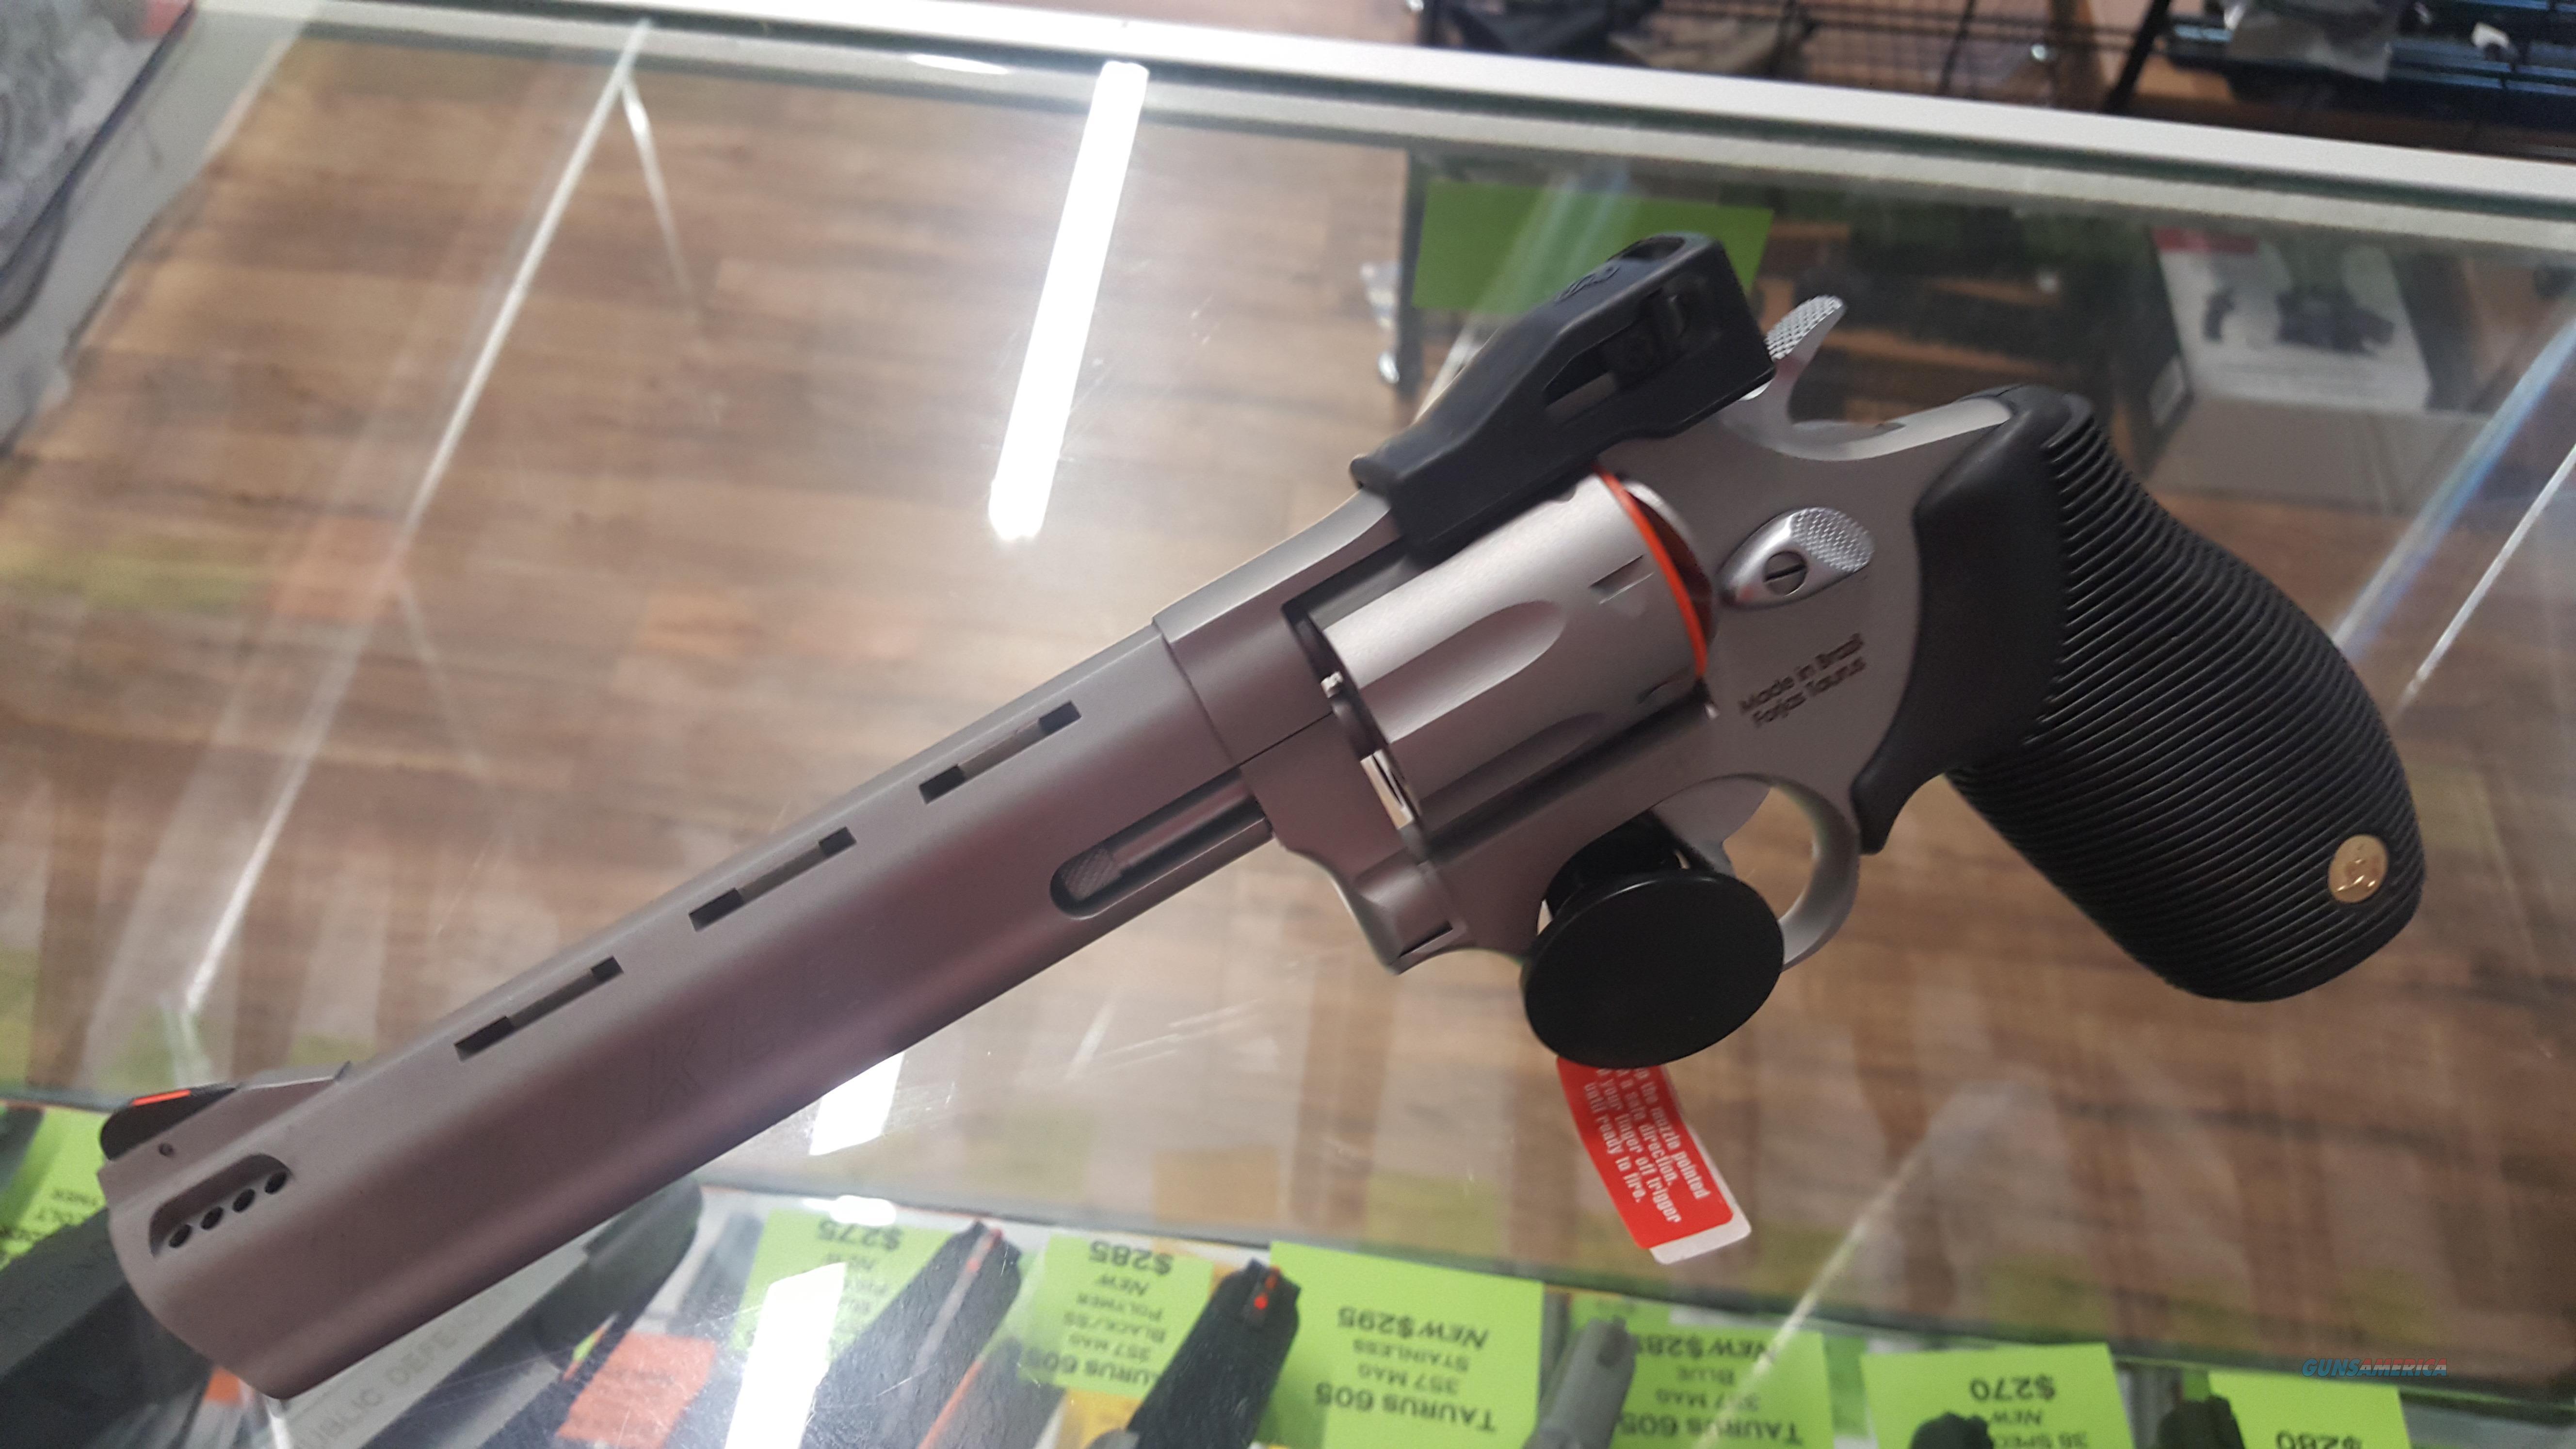 "Taurus 627 Tracker .357 Mag, 6 1/2"" Ported Barrel Stainless! NEW  Guns > Pistols > Taurus Pistols > Revolvers"